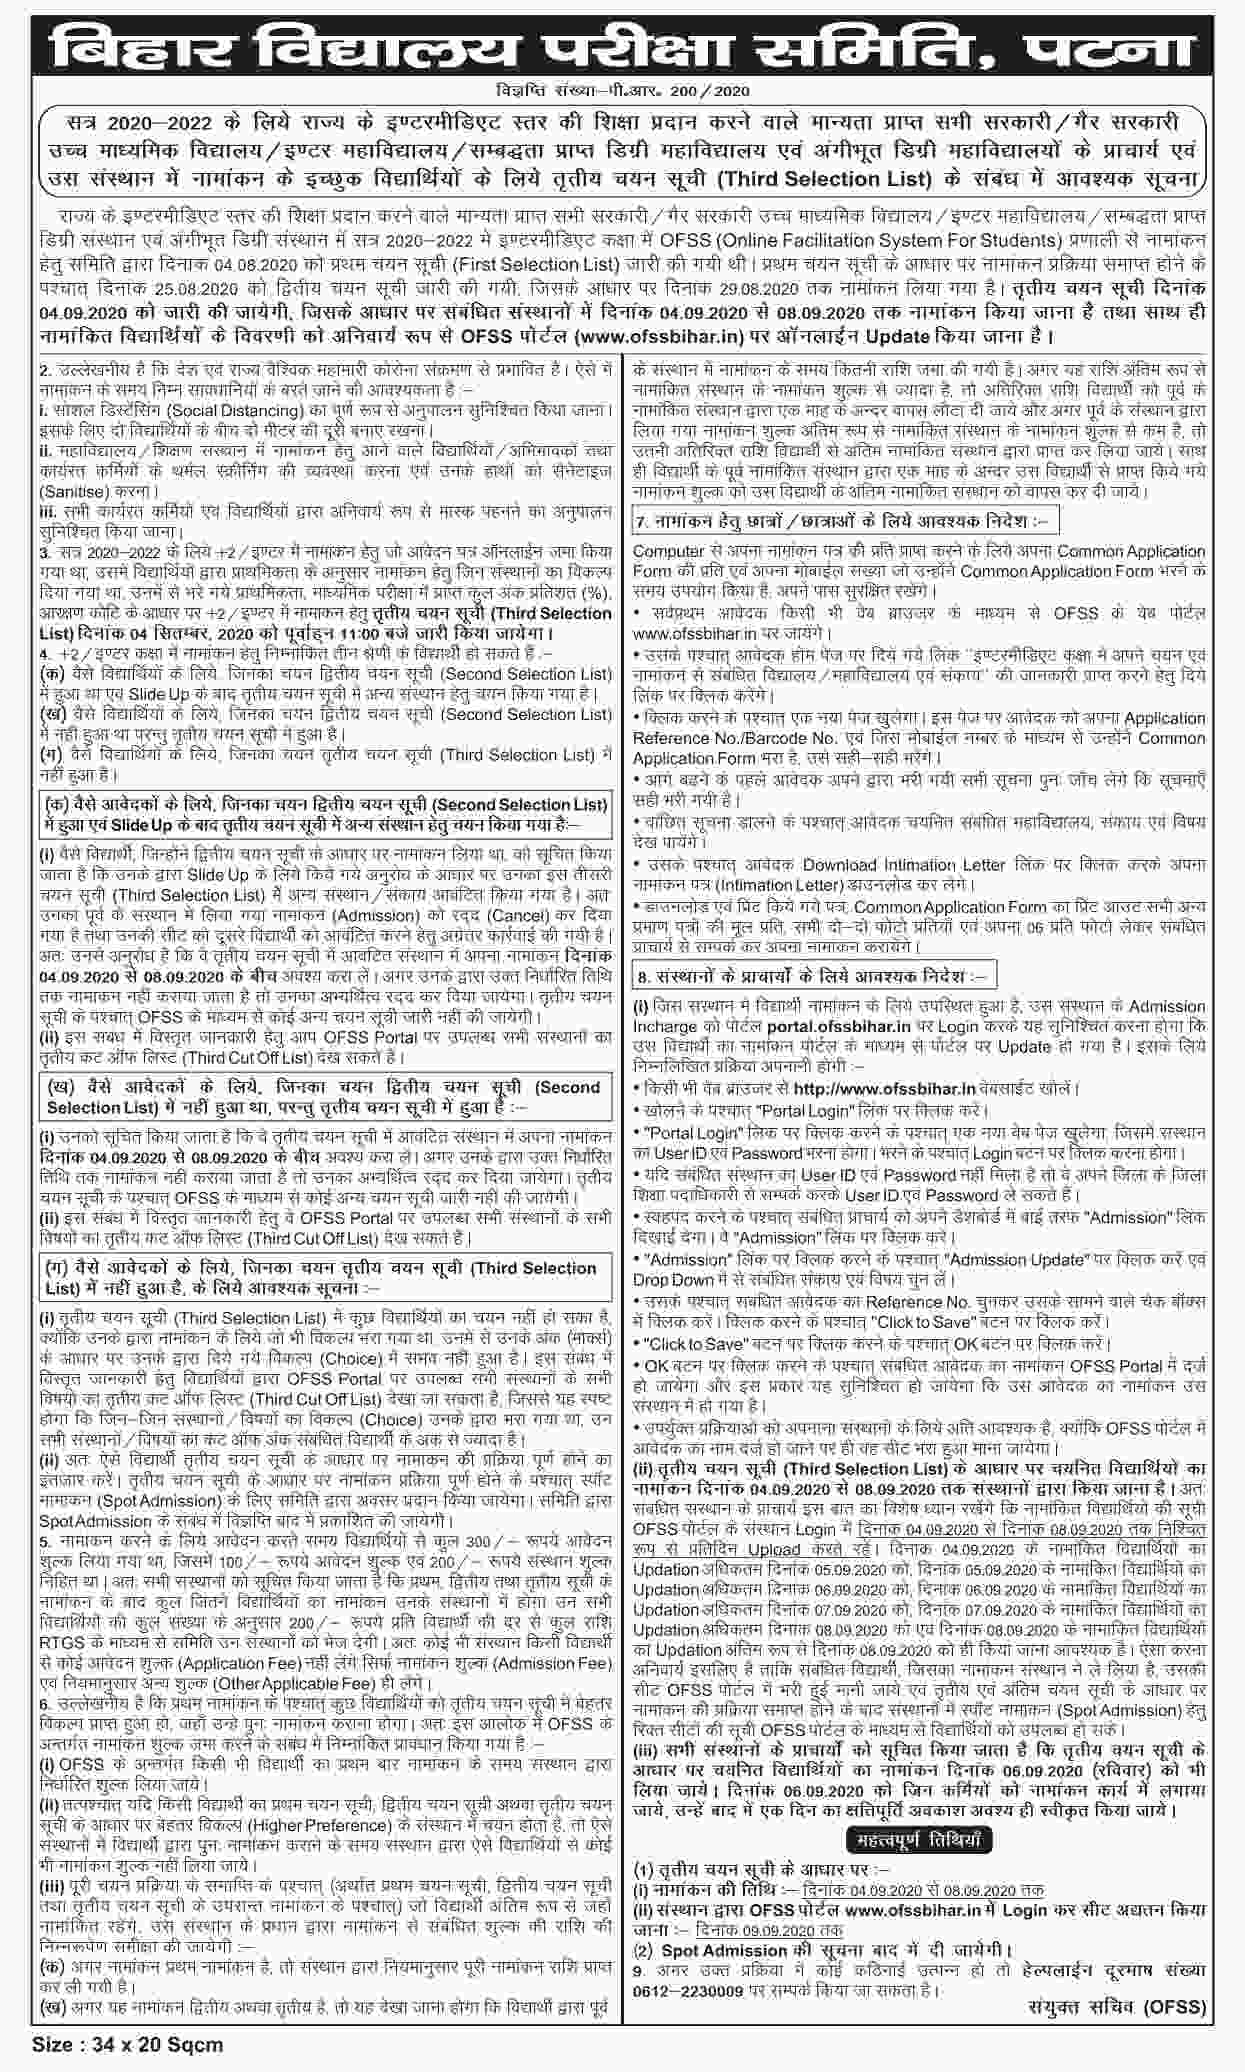 OFSS Bihar 12th Admission 2020 3rd Merit List: ओएफएसएस बिहार तीसरी मेरिट लिस्ट 2020 डाउनलोड 4 सितंबर